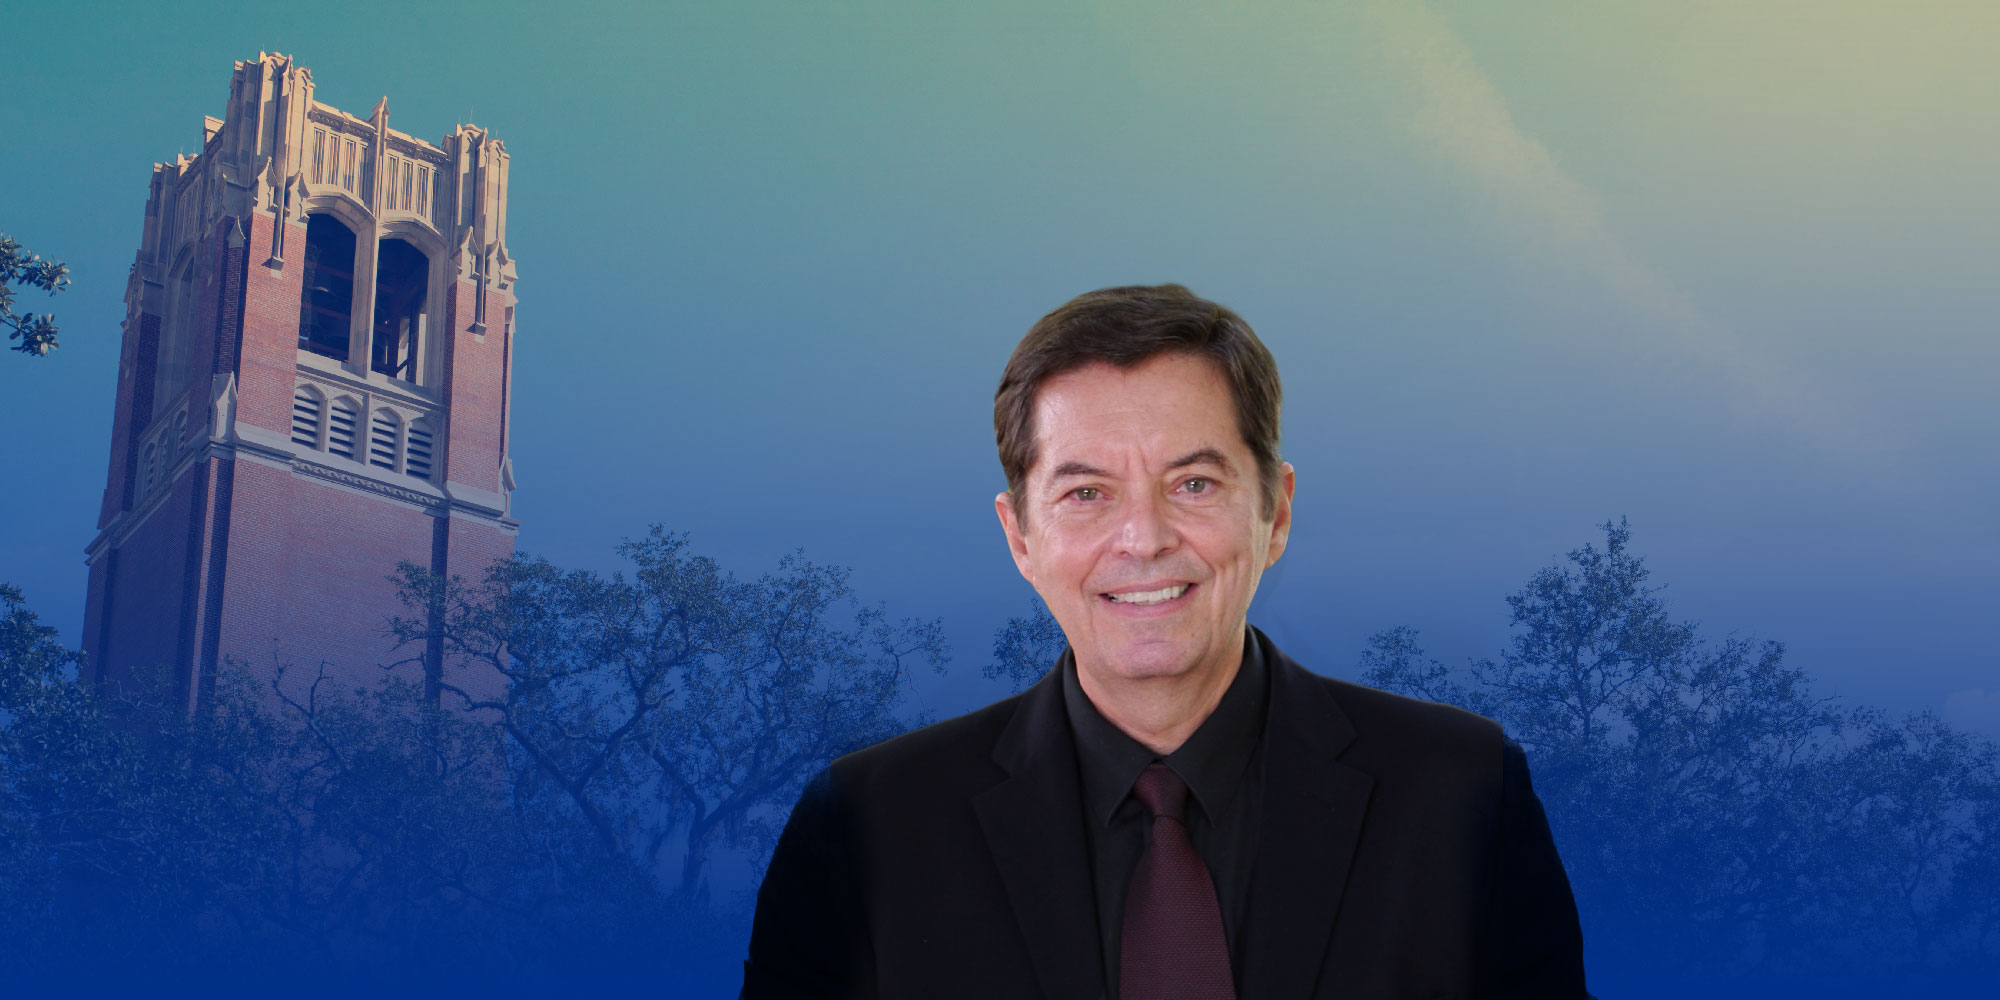 Dr. José A. B. Fortes